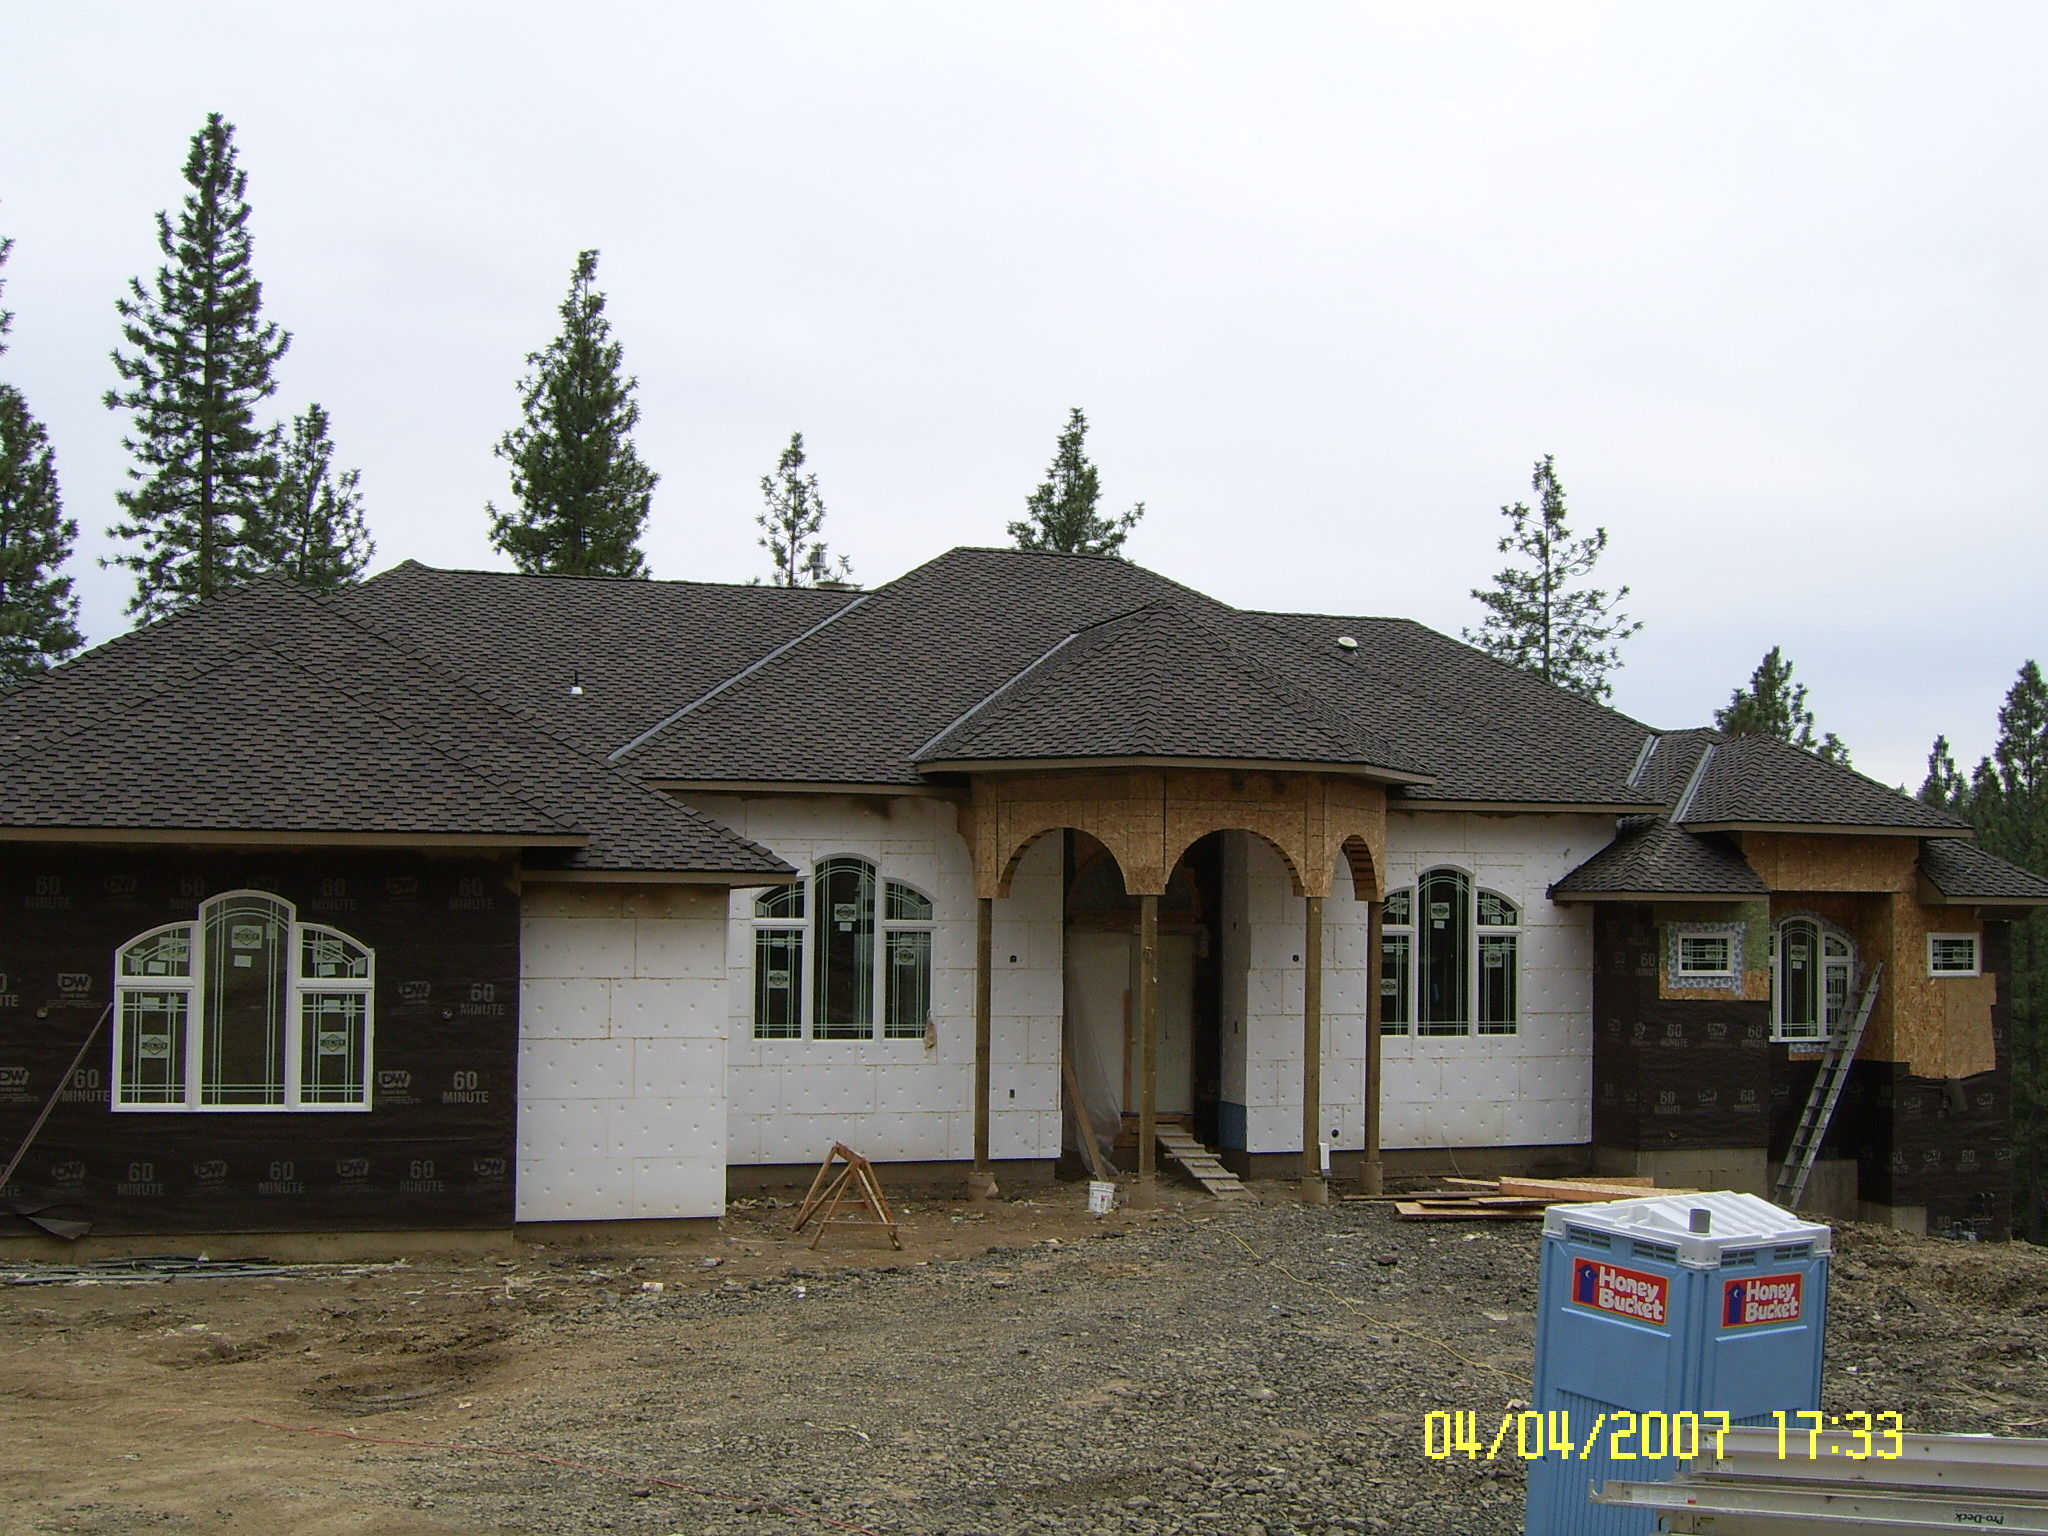 wwwhigh definition wallpapercomphotocustom home wallpaper6html 2048x1536